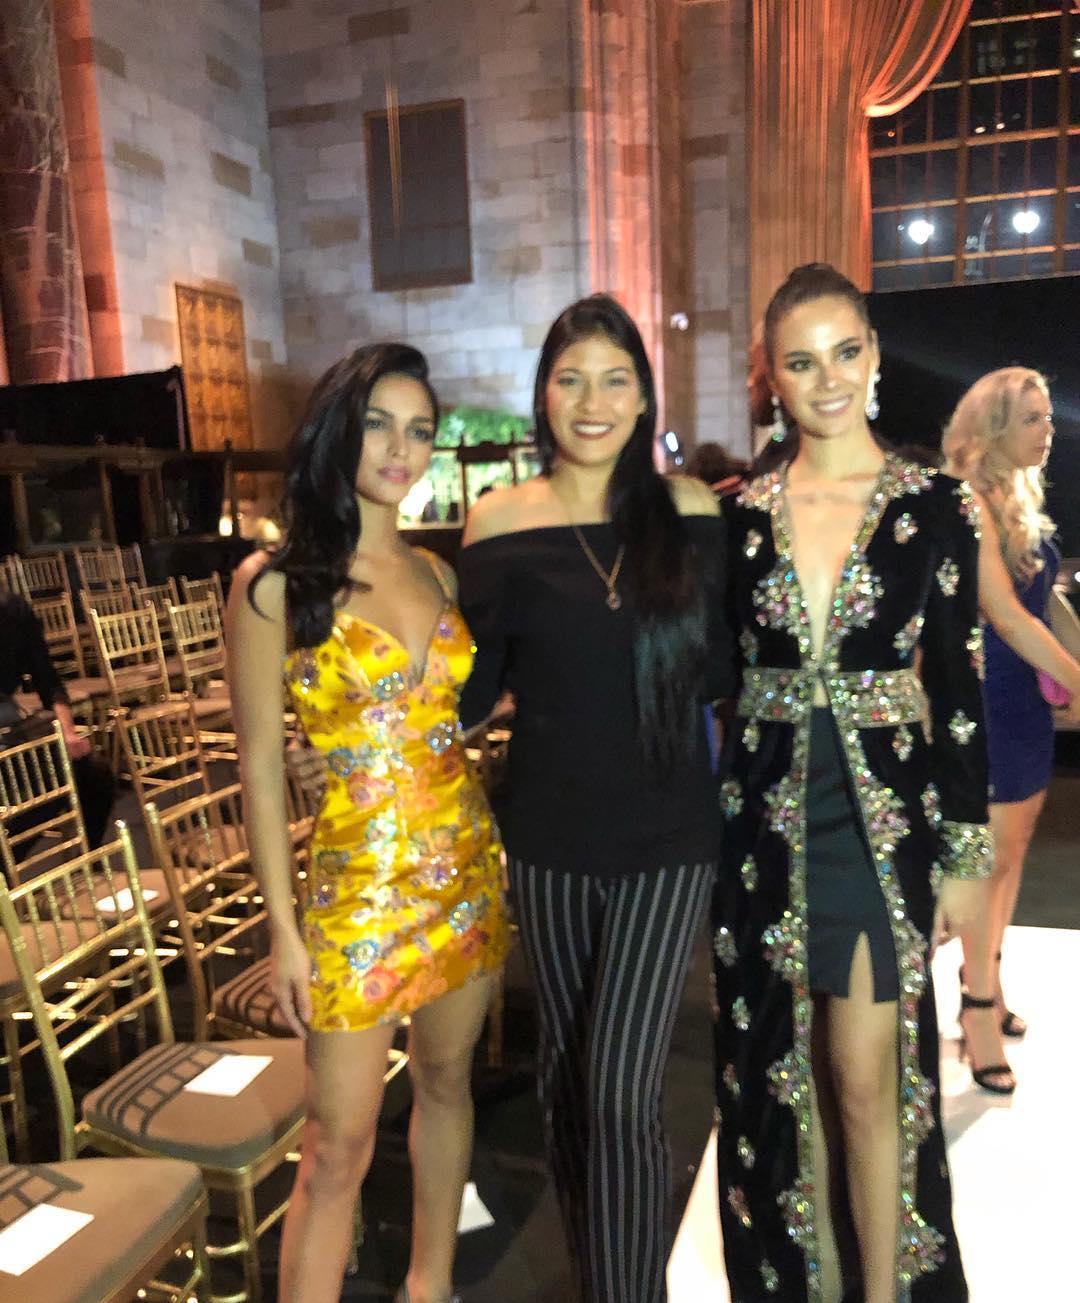 miss universe 2018 & miss puerto rico, top 5 de mu 2018, assiste the sherri hill show durante new york fashion week.  Cs35tdgj